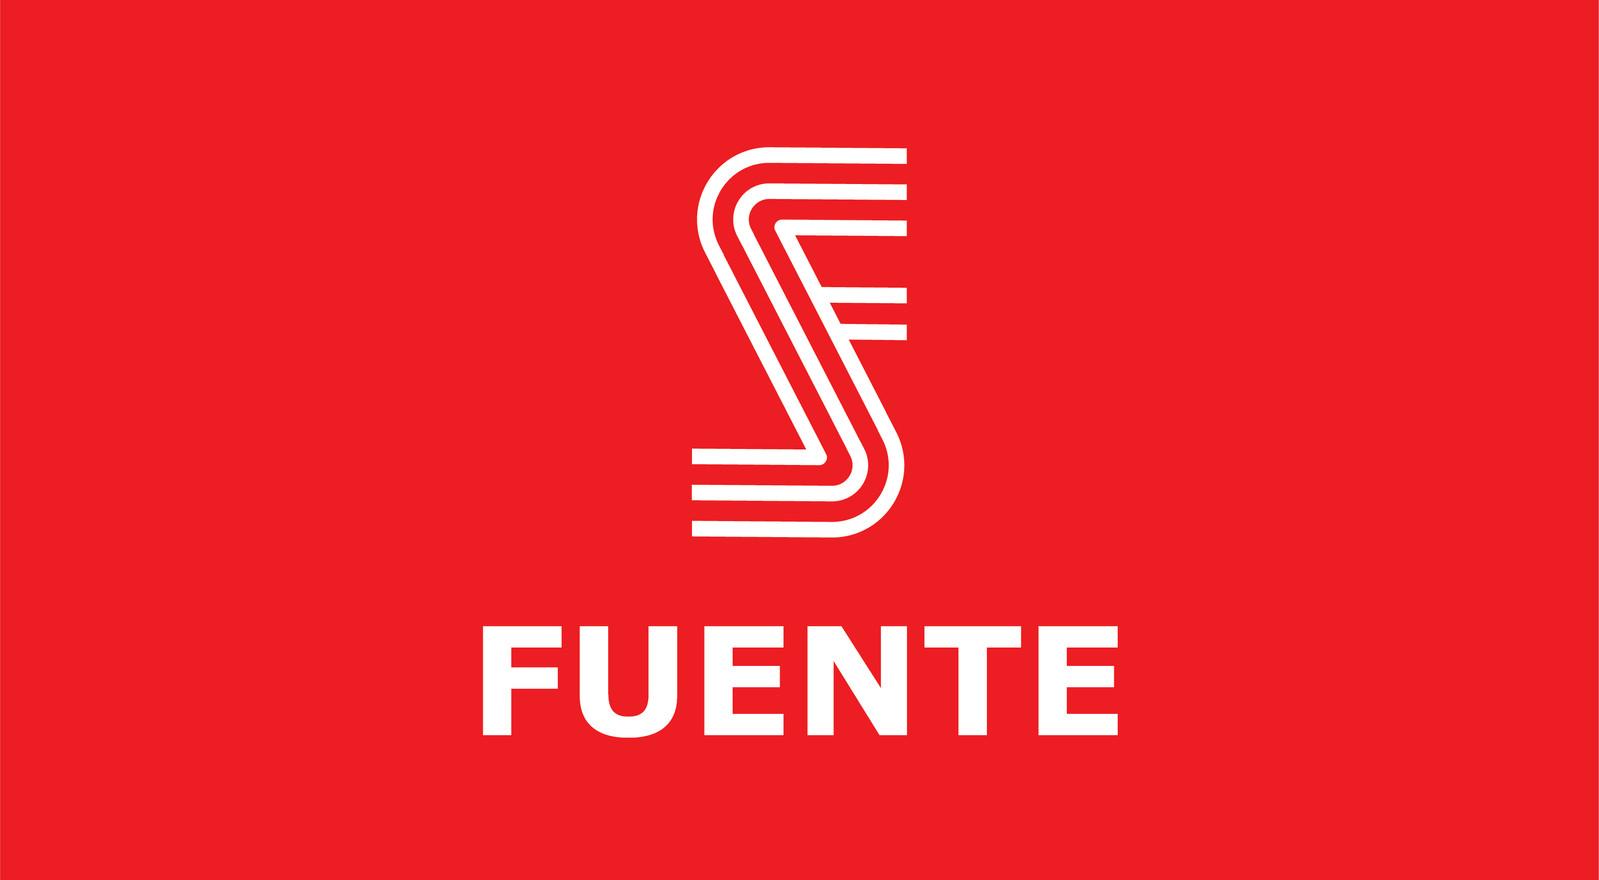 Fuente- curved logo.jpg